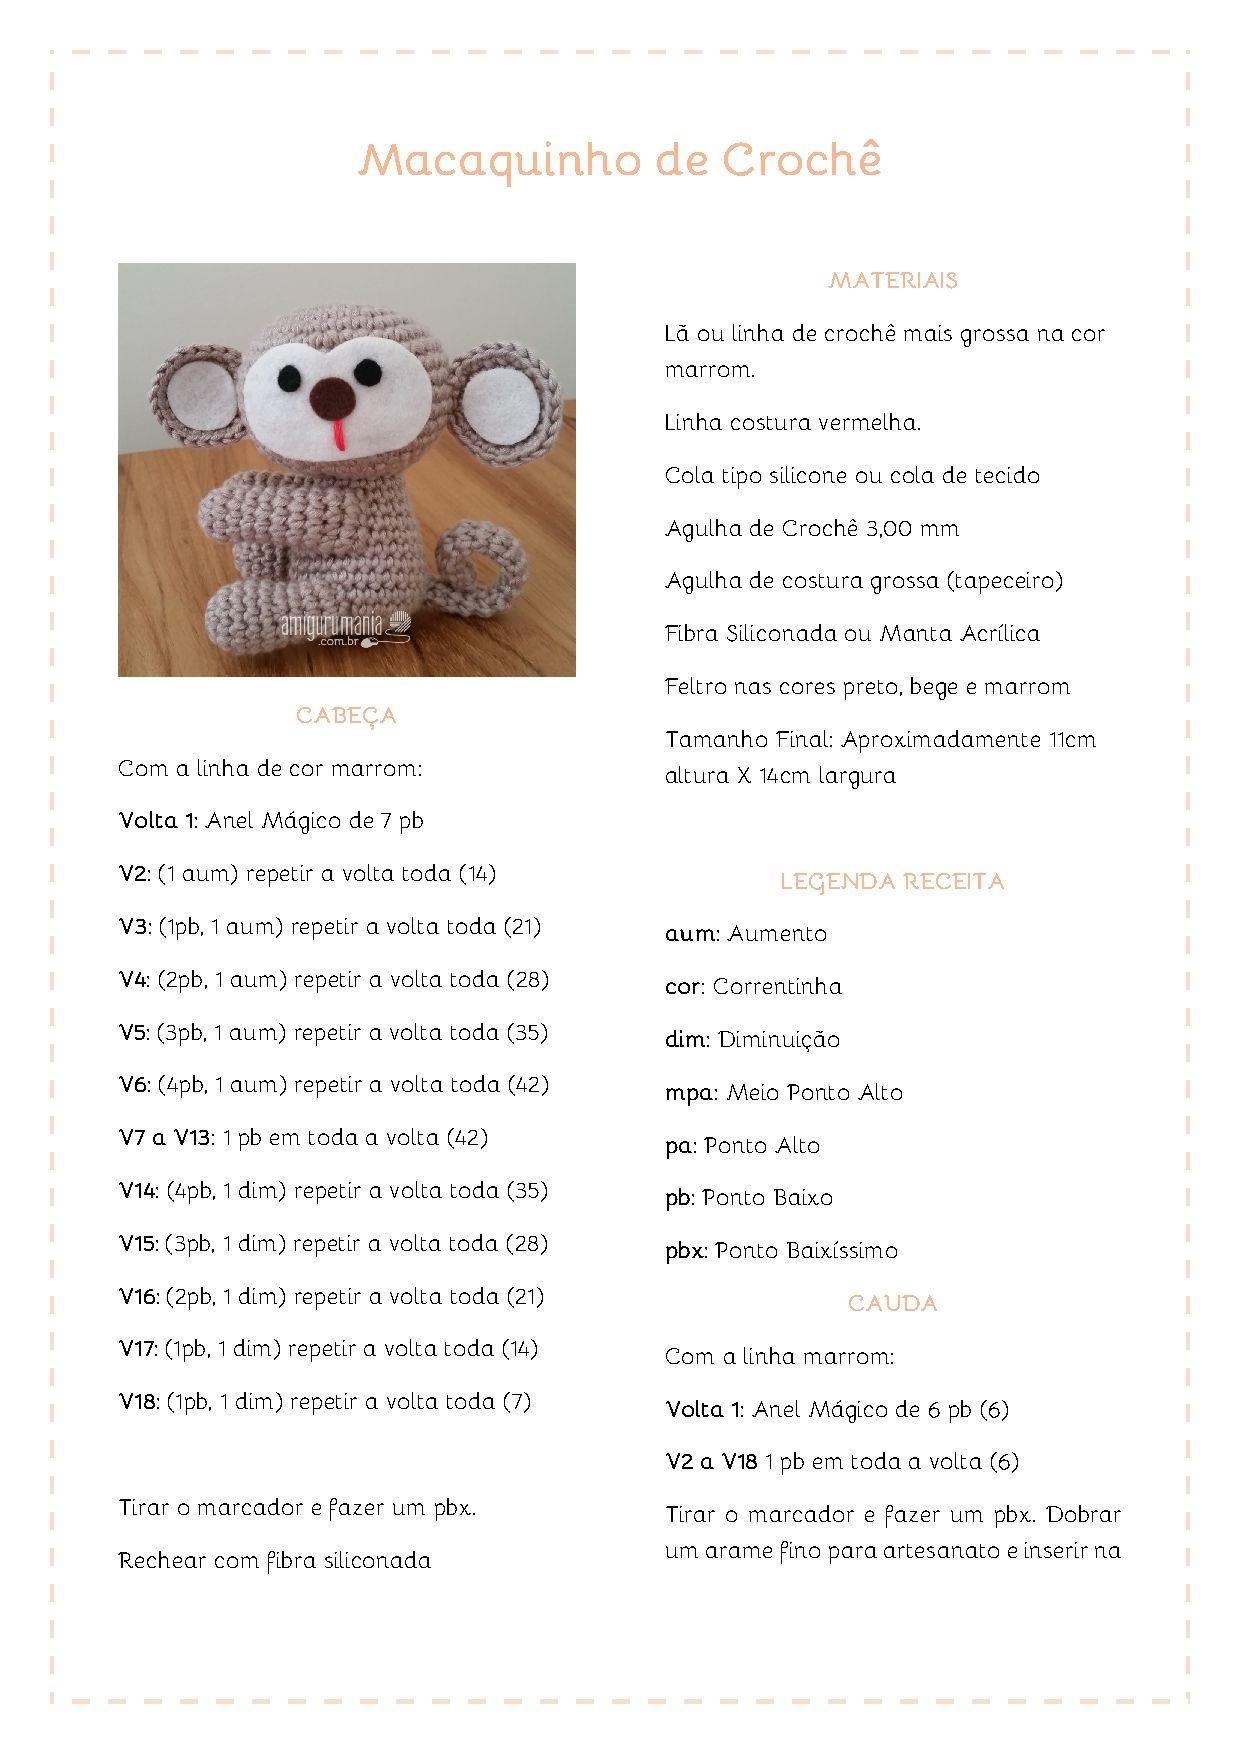 Pin de Judith Keyzer en Crochet - Bits And Pieces 8 ! | Pinterest ...